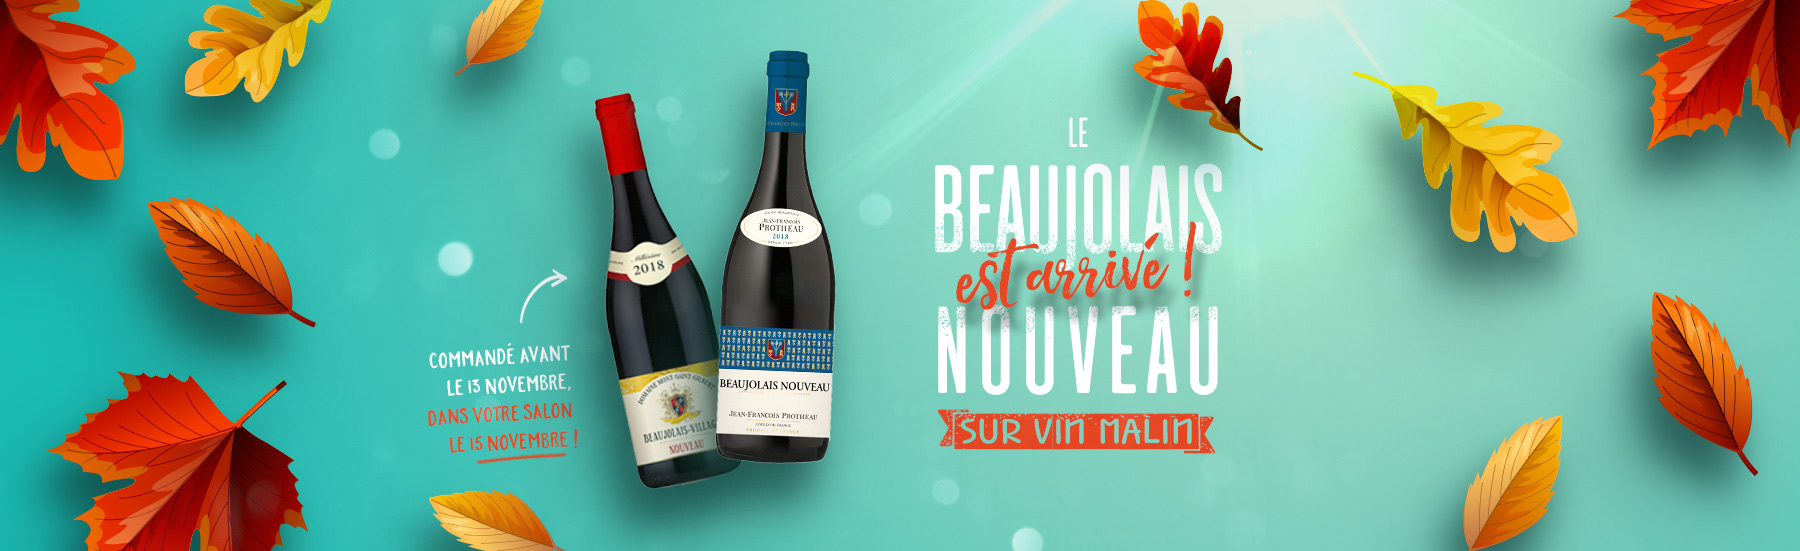 1800x551_beaujolais-nouveau